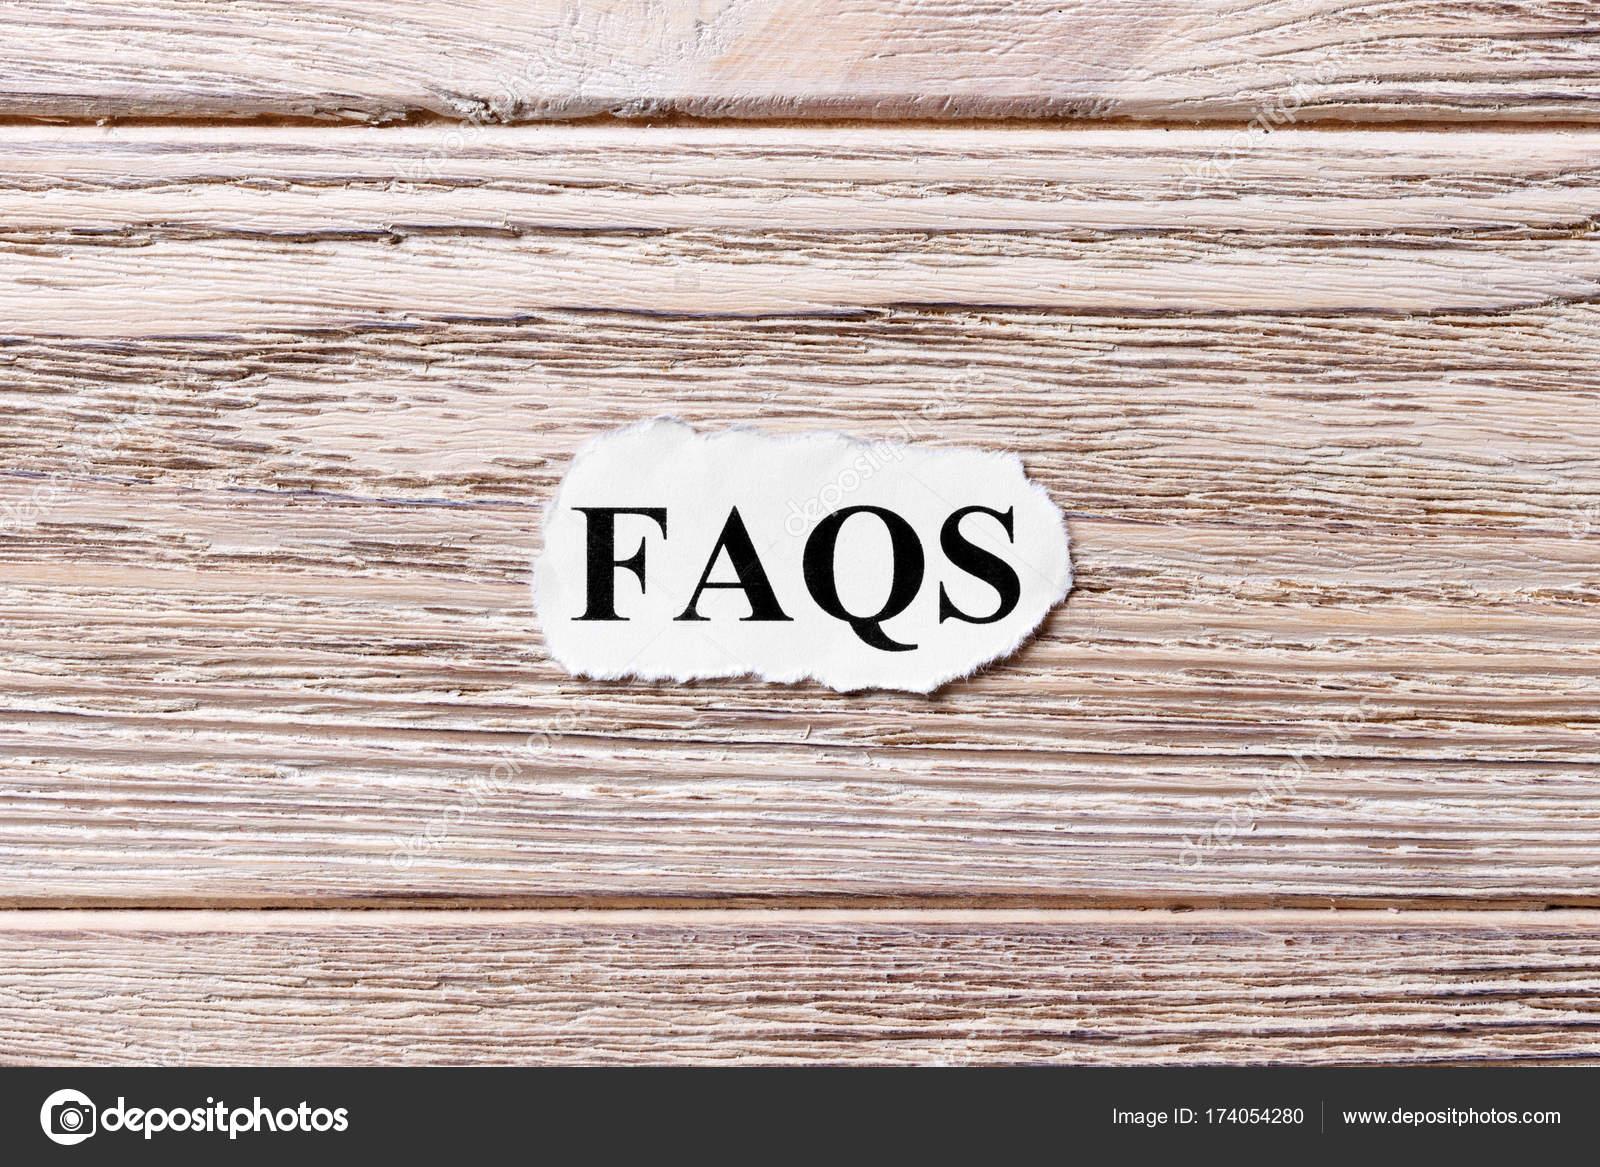 Časté otázky slova na papíře. často kladené otázky koncepce. Slova z FAQ na  dřevěné f267423365